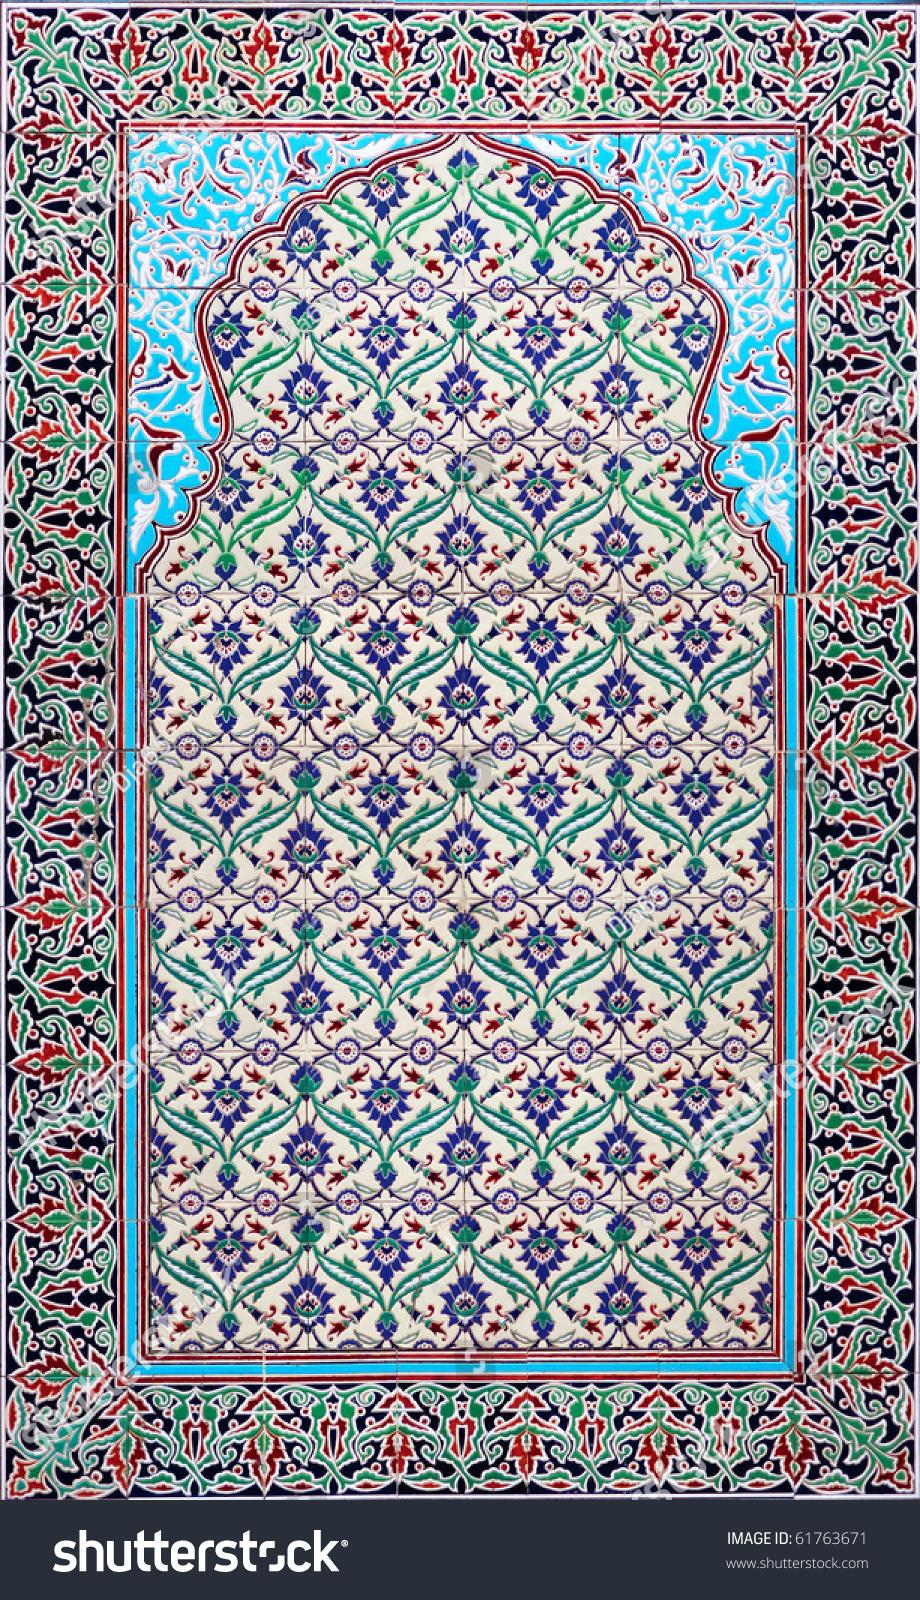 Cute 16X32 Ceiling Tiles Small 18 Inch Floor Tile Round 18 X 18 Ceramic Tile 20 X 20 Floor Tile Patterns Old 24 X 24 Ceiling Tiles Brown3 X 12 Subway Tile Arabic Ceramic Tiles Stock Photo 61763671   Shutterstock